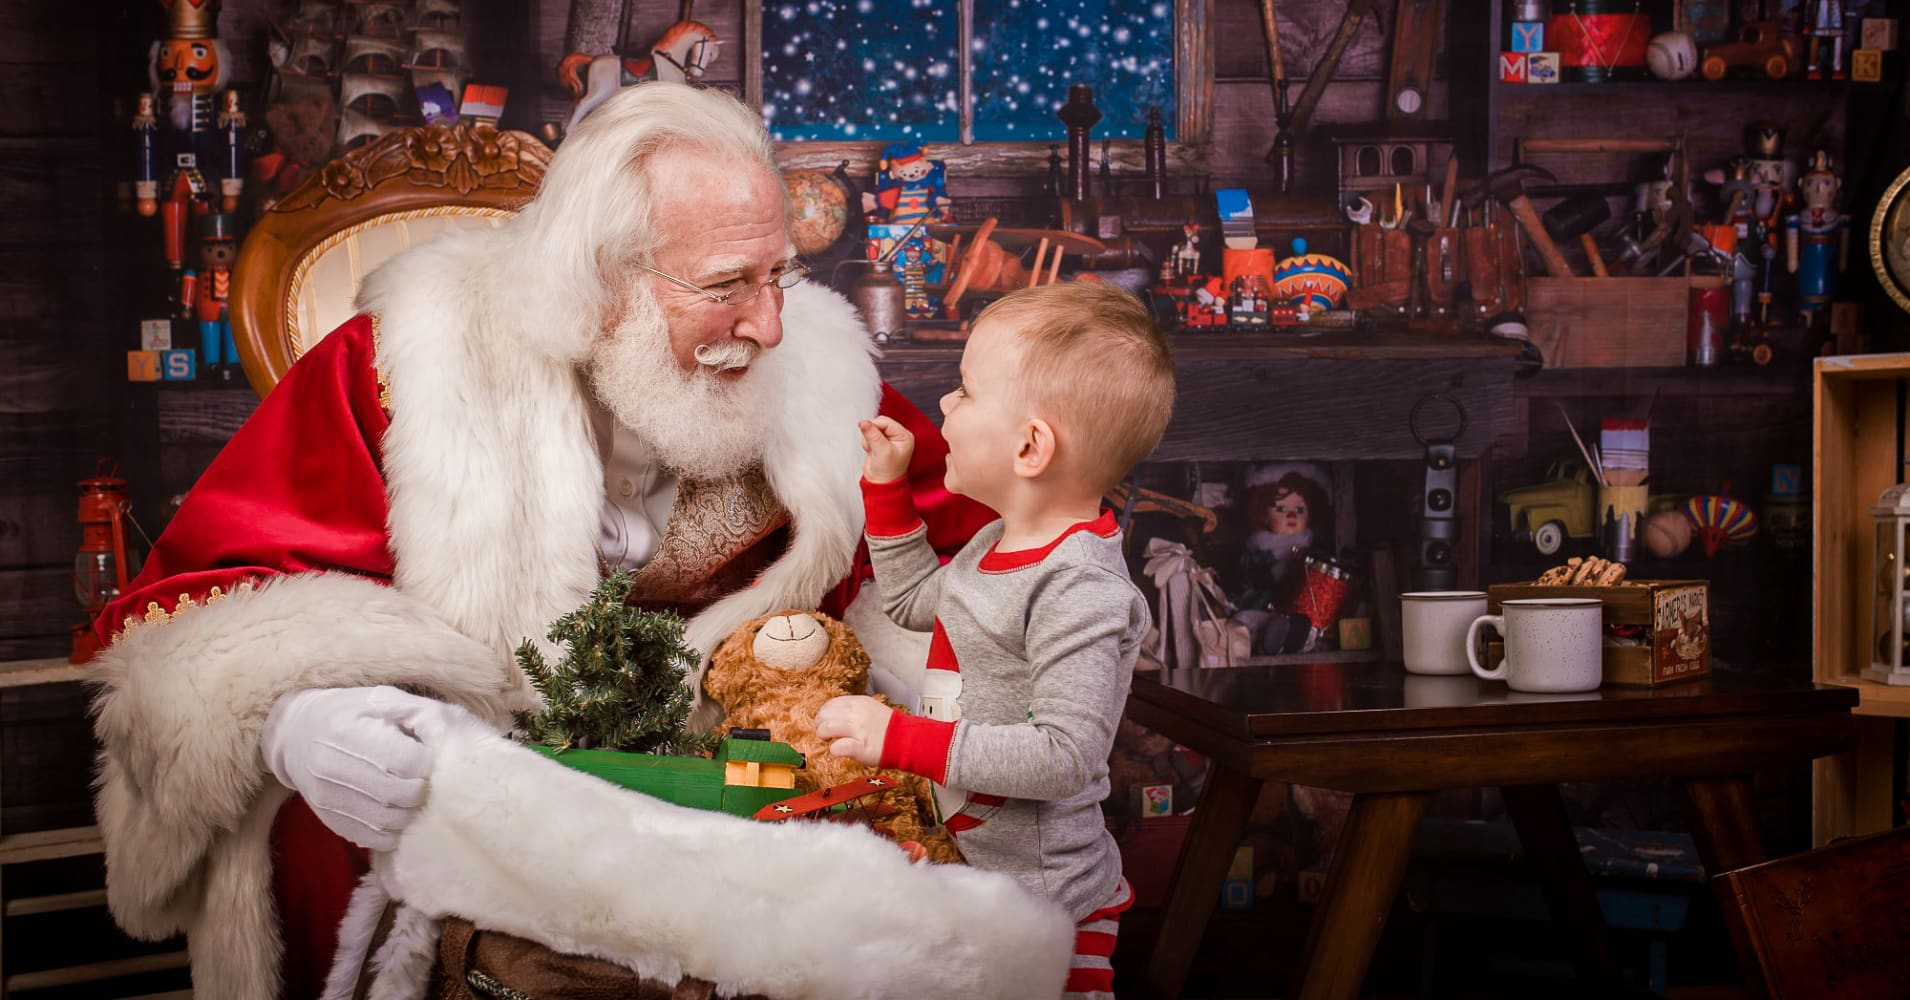 Santa Rick Rosenthal during a holiday photo session.